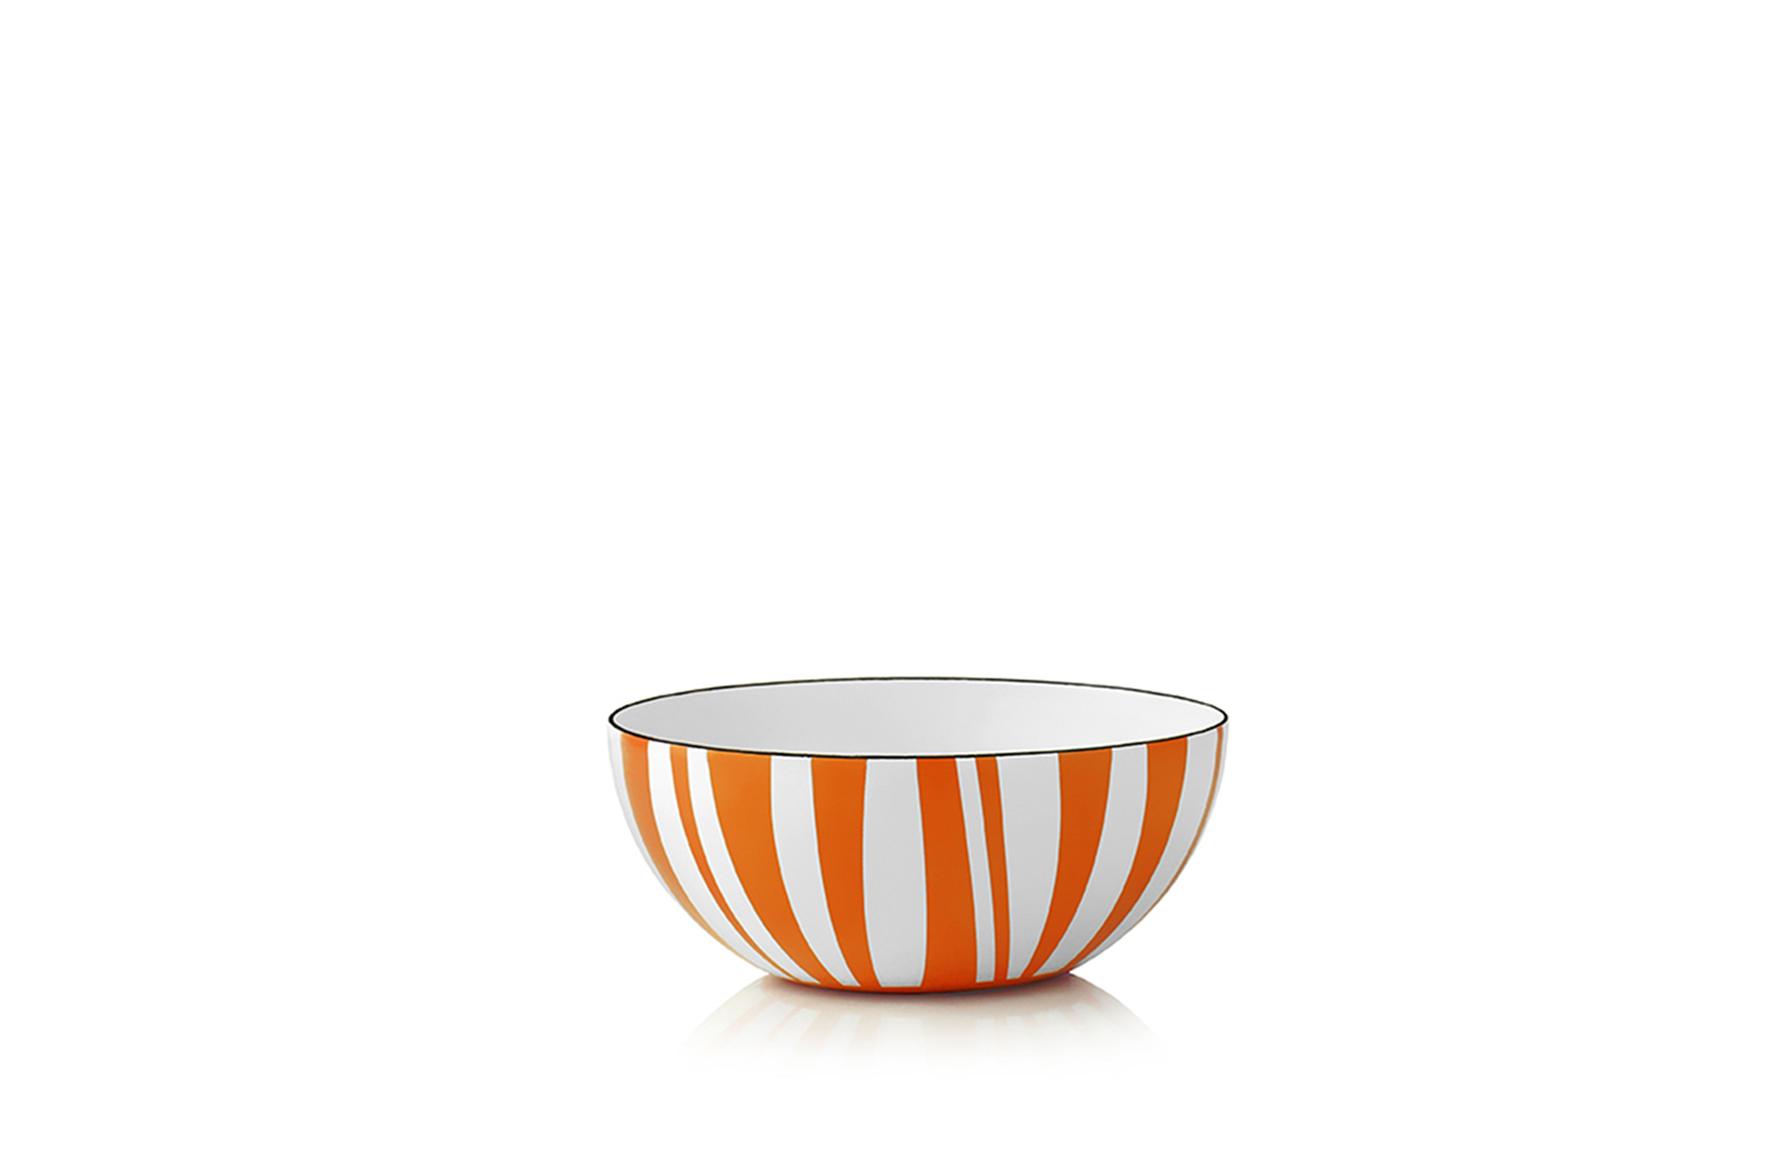 10 cm - Stripes kollektionOrange